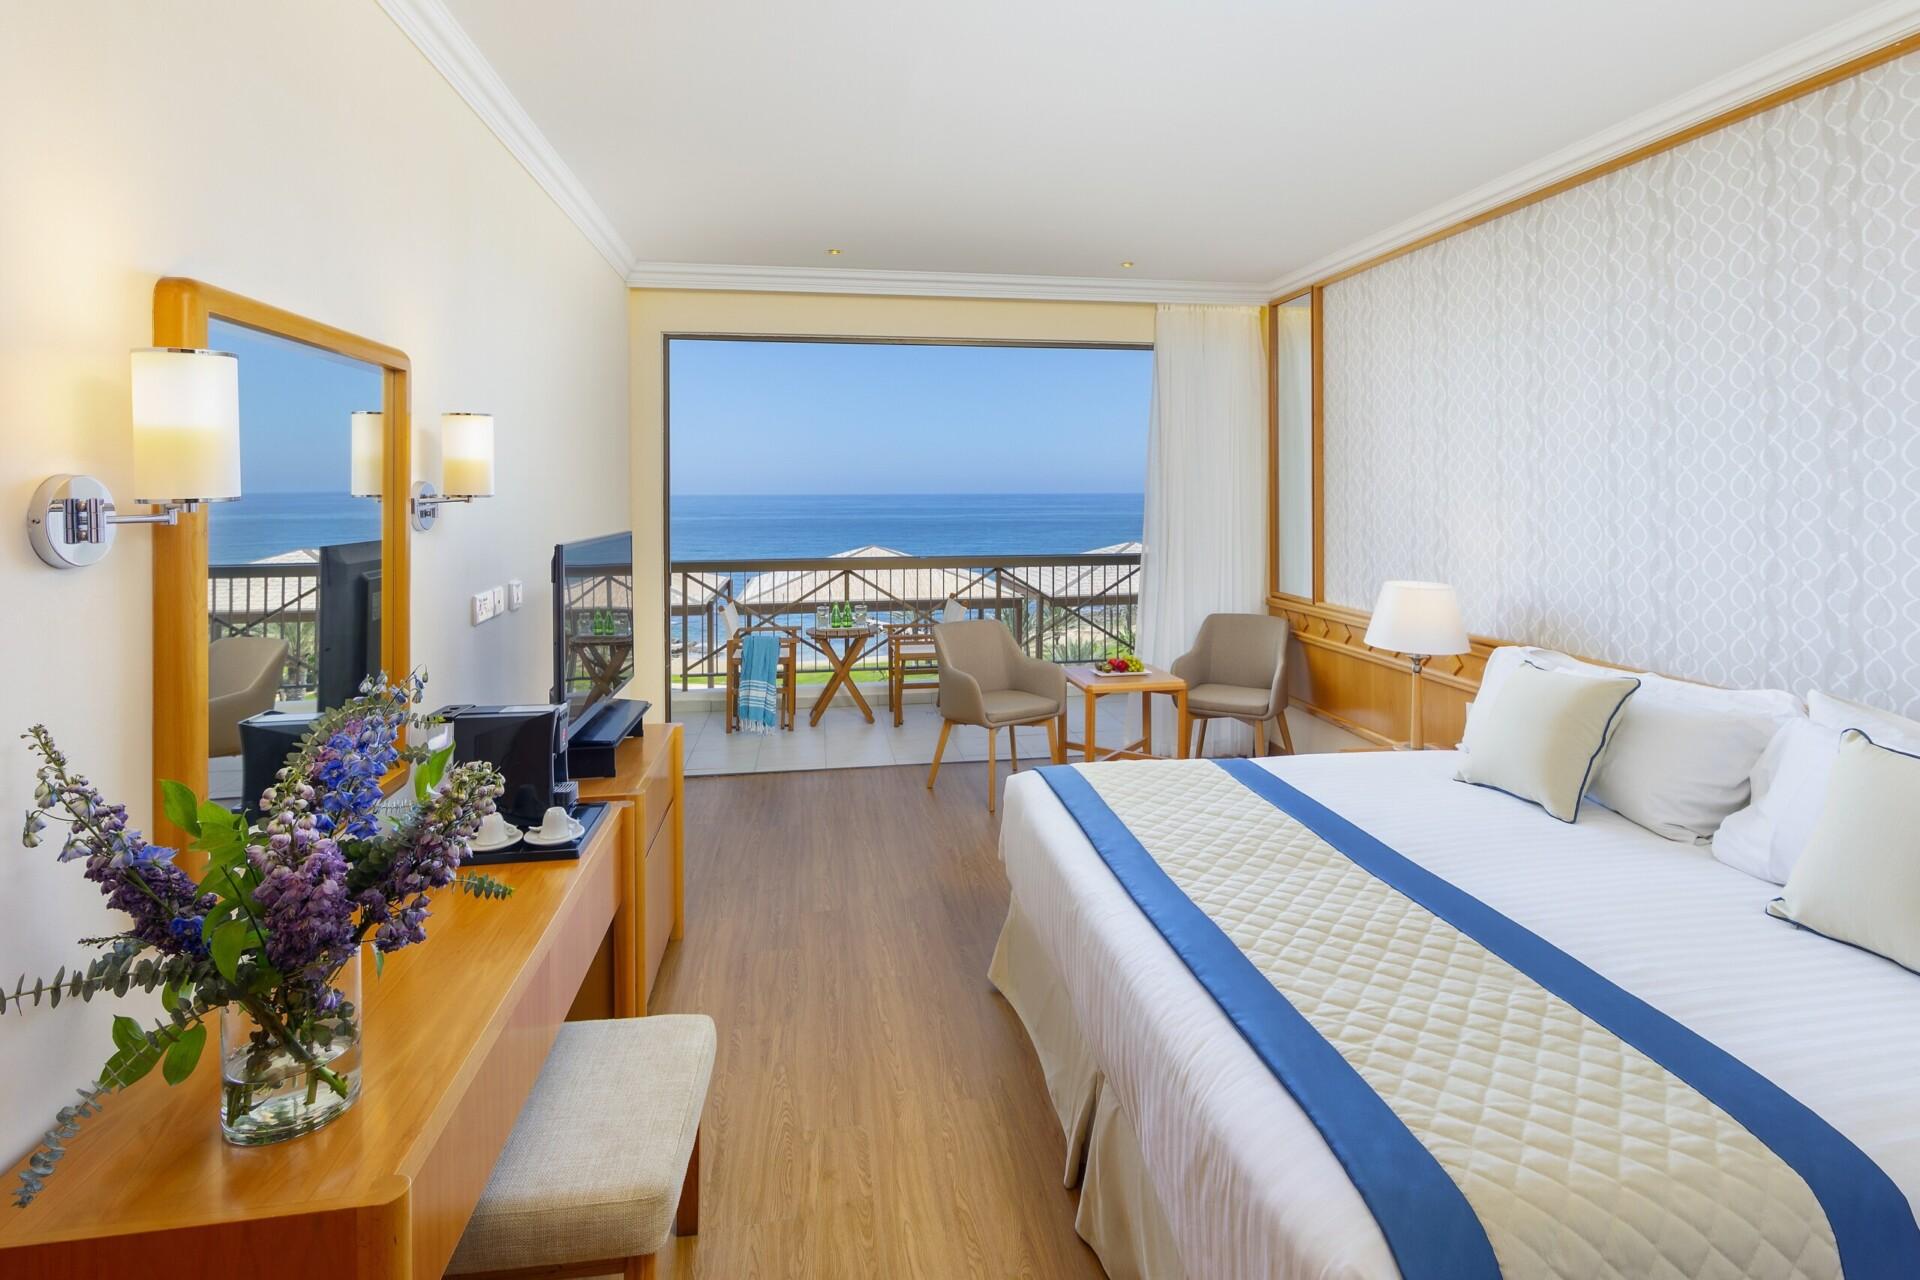 49 ATHENA BEACH HOTEL SUPERIOR DELUXE ROOM SV WITH BALCONY